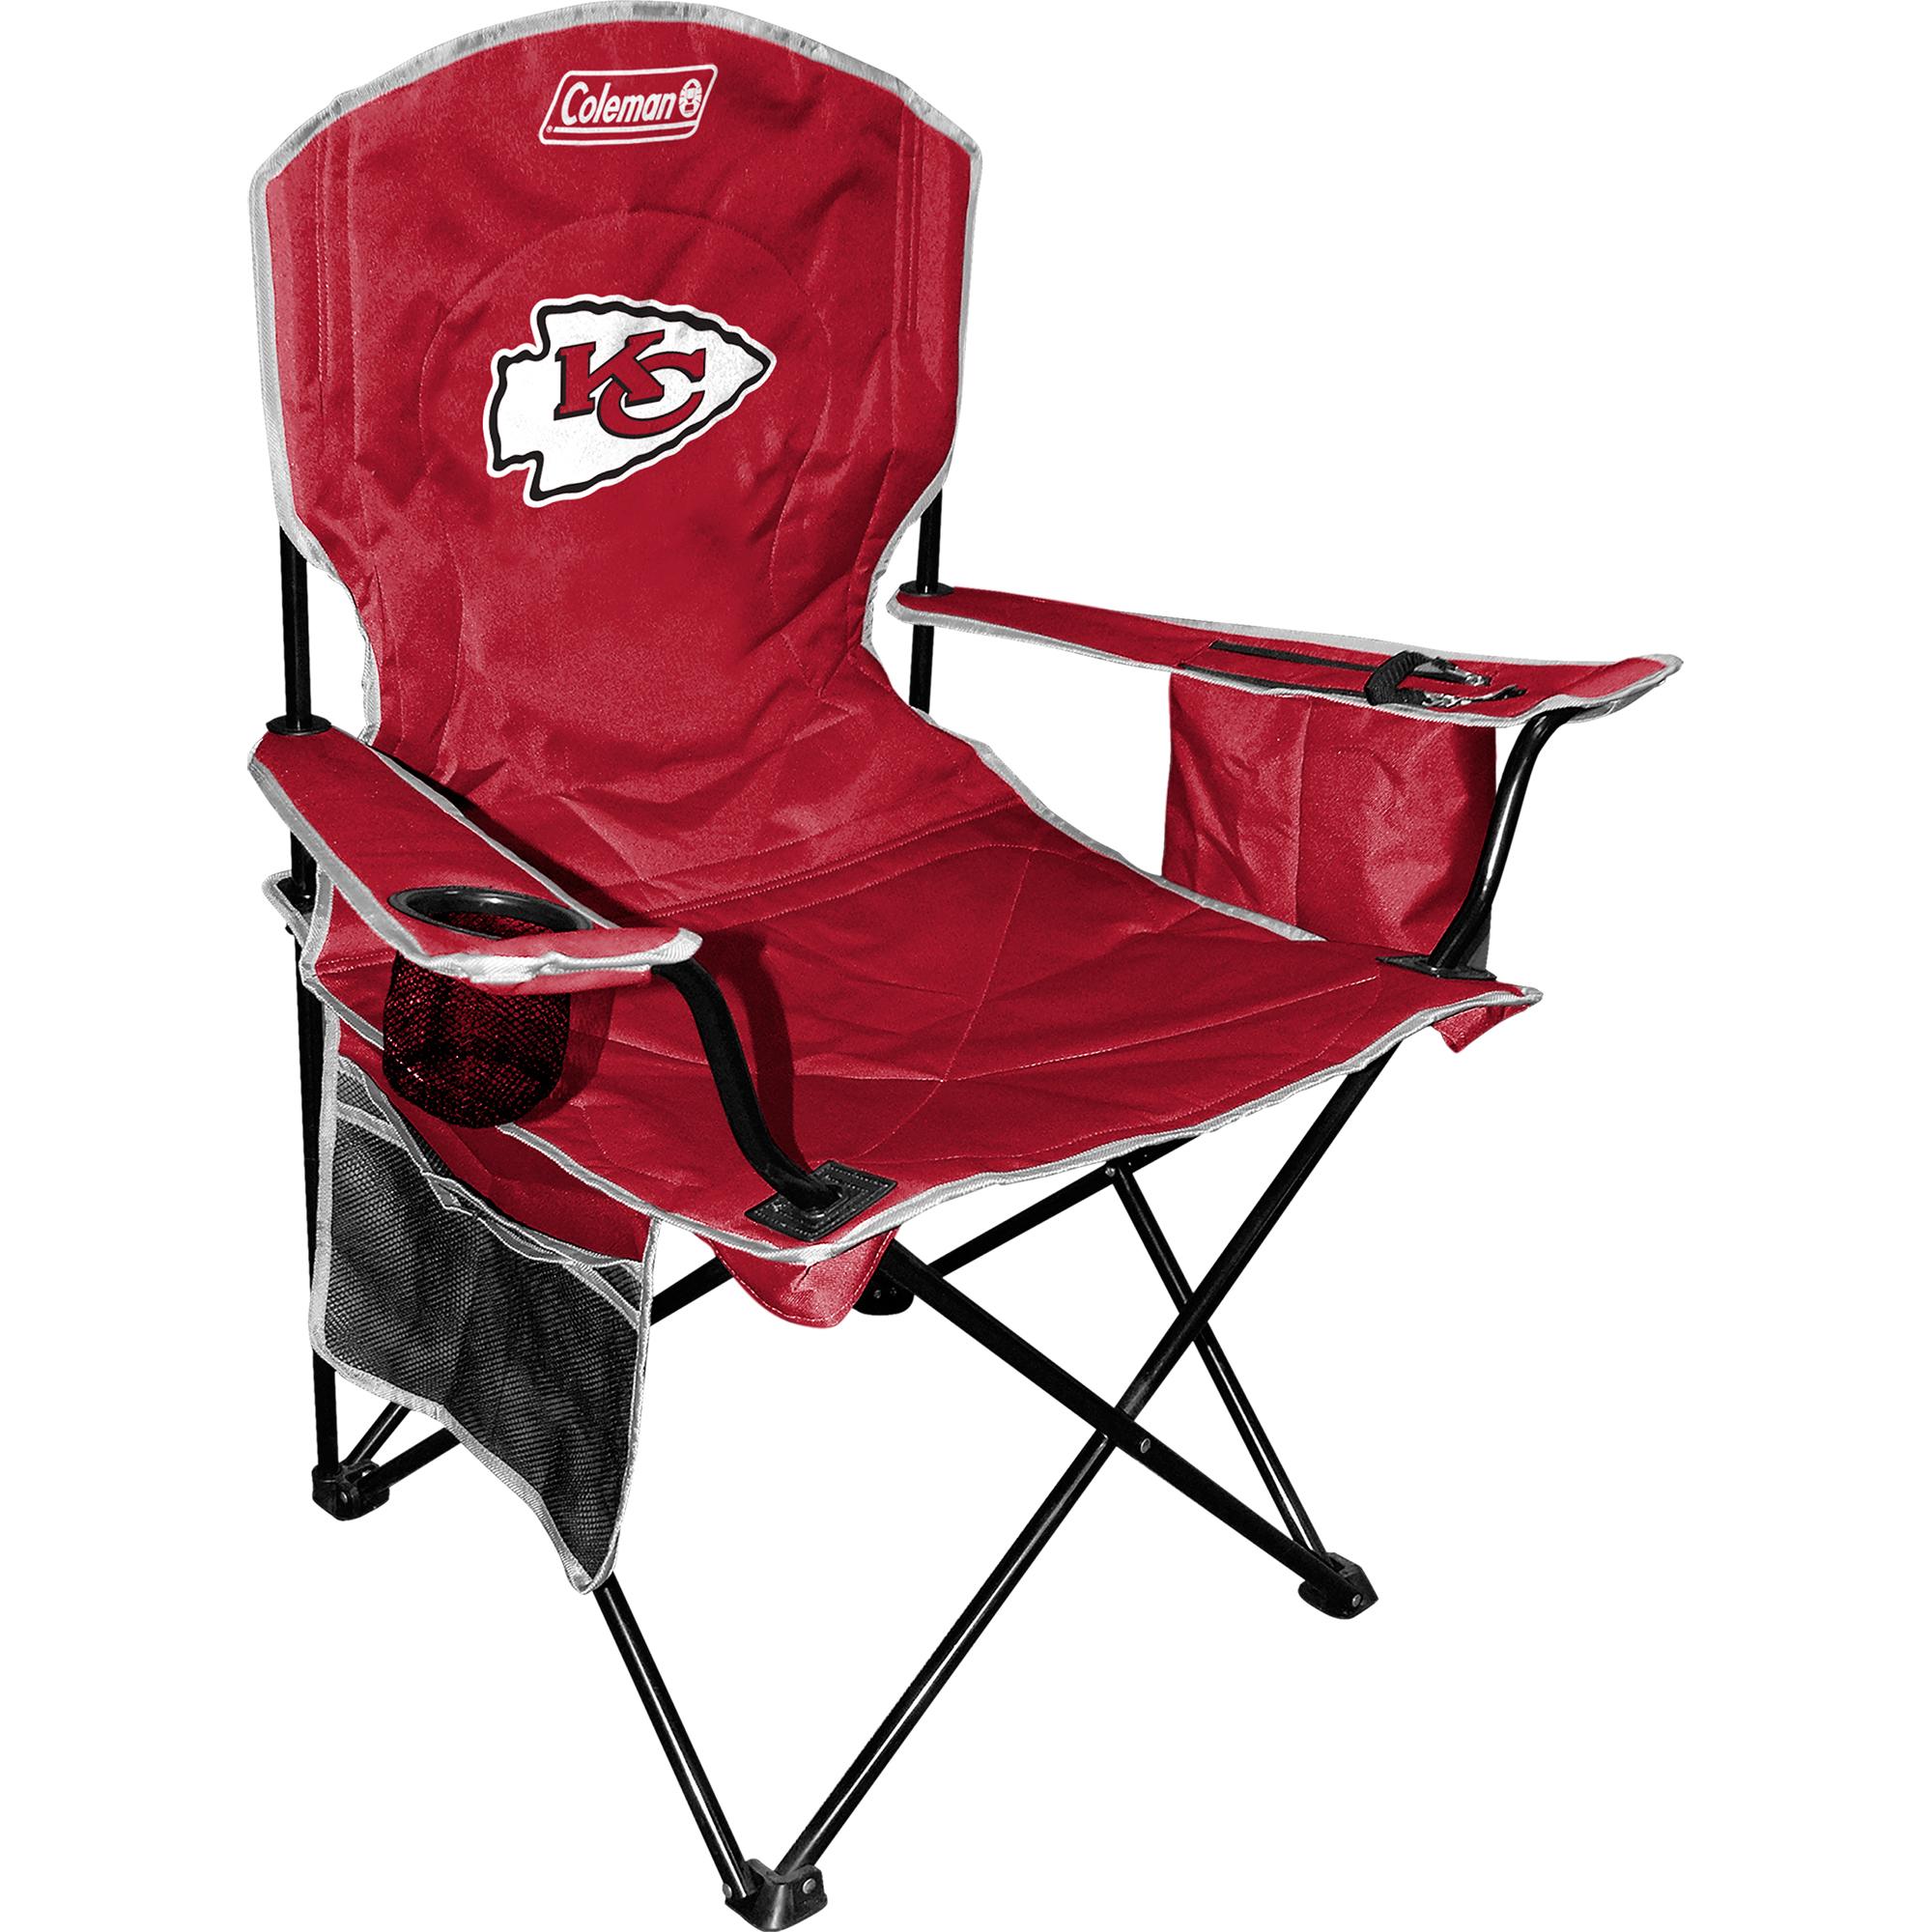 Coleman Kansas City Chiefs Cooler Quad Chair